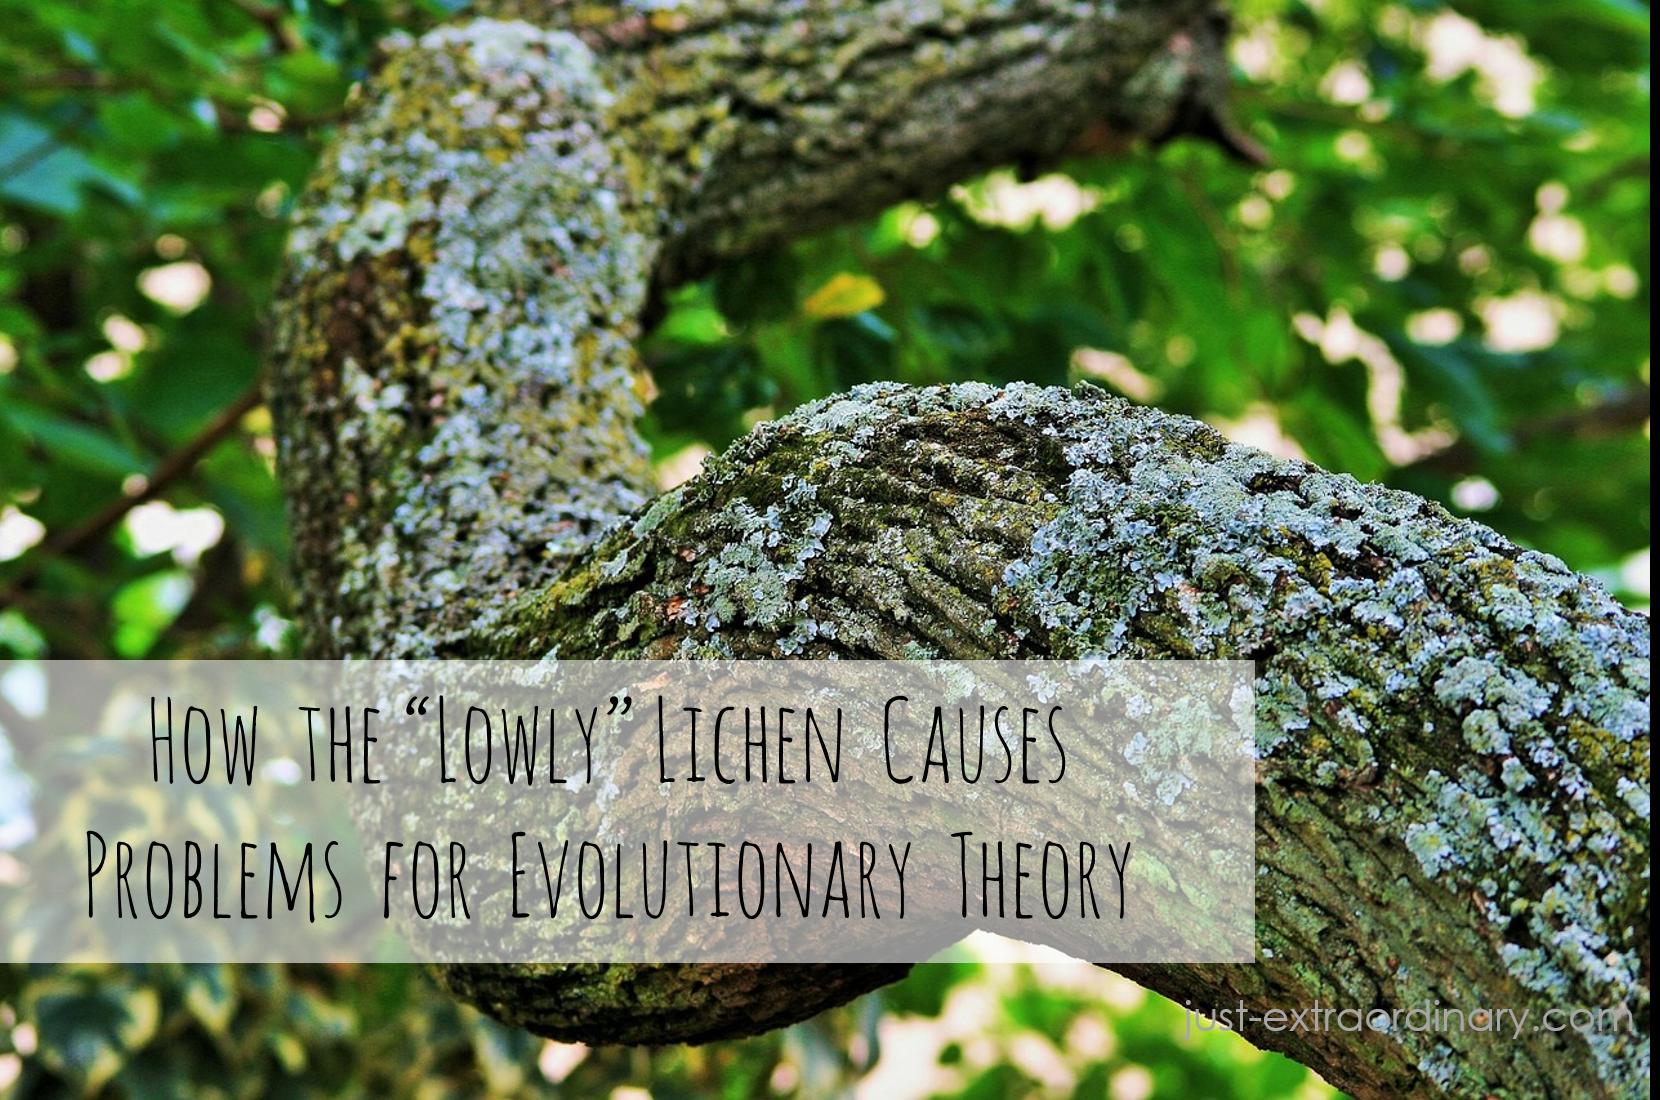 Lichens-and-evolution-just-extraordinary.com_